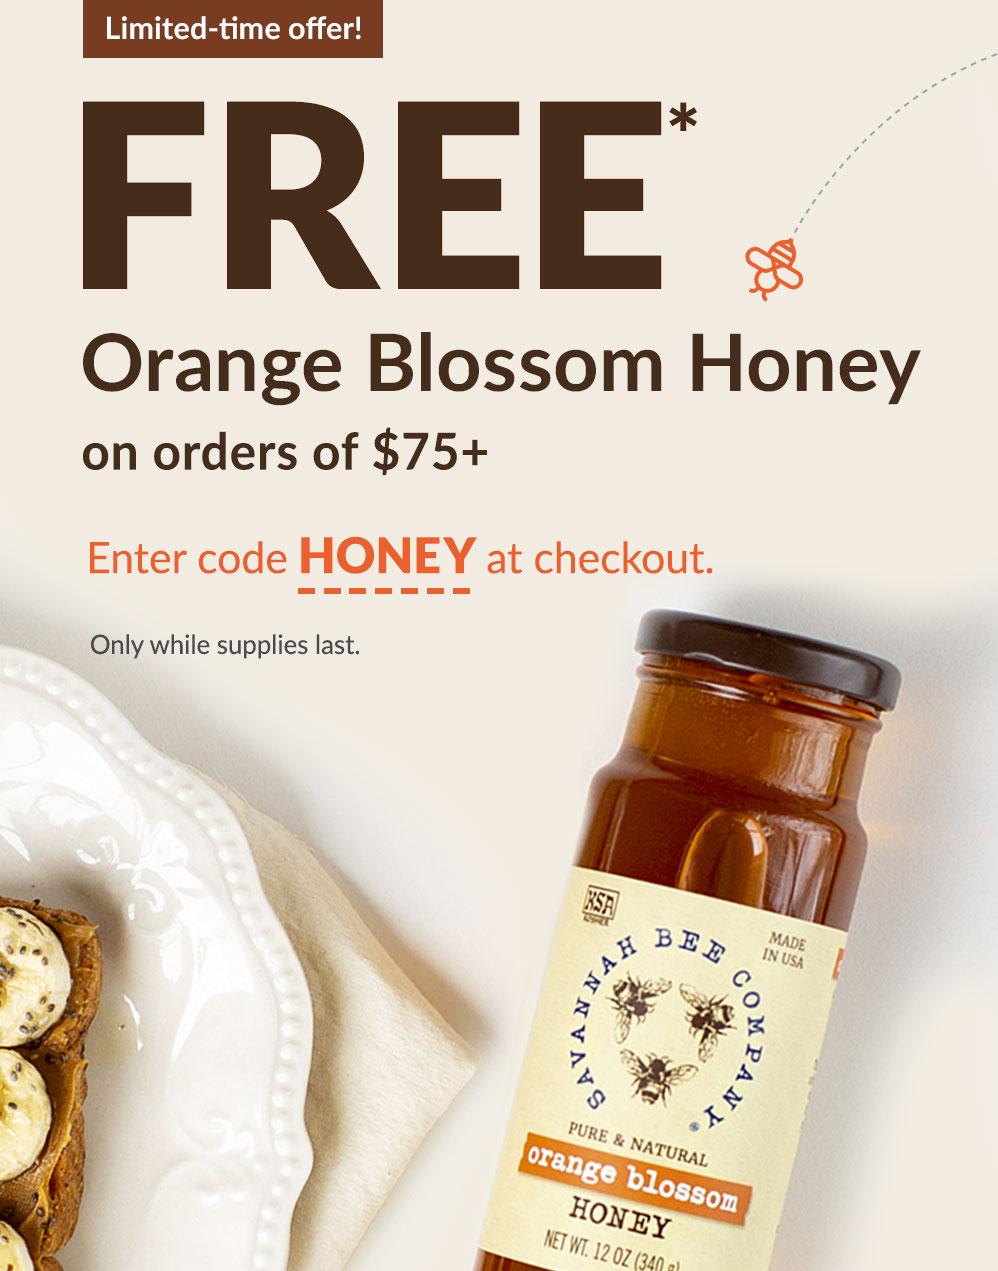 Free* Orange Blossom Honey on orders of $75+